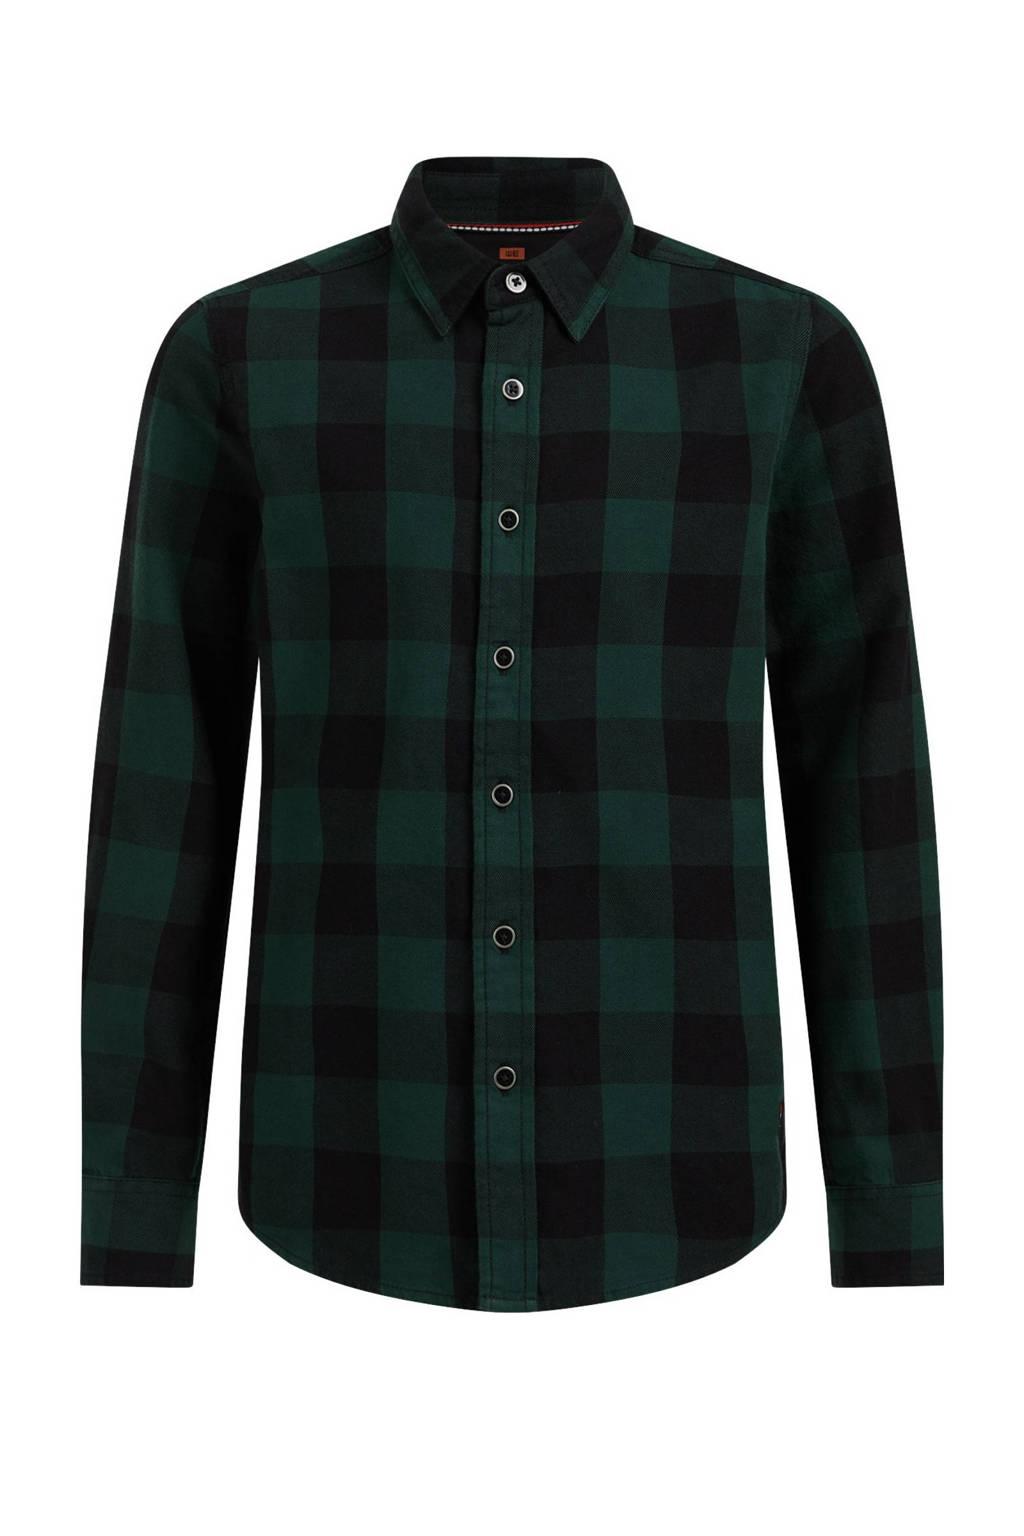 WE Fashion geruite overhemd donkergroen/zwart, Donkergroen/zwart